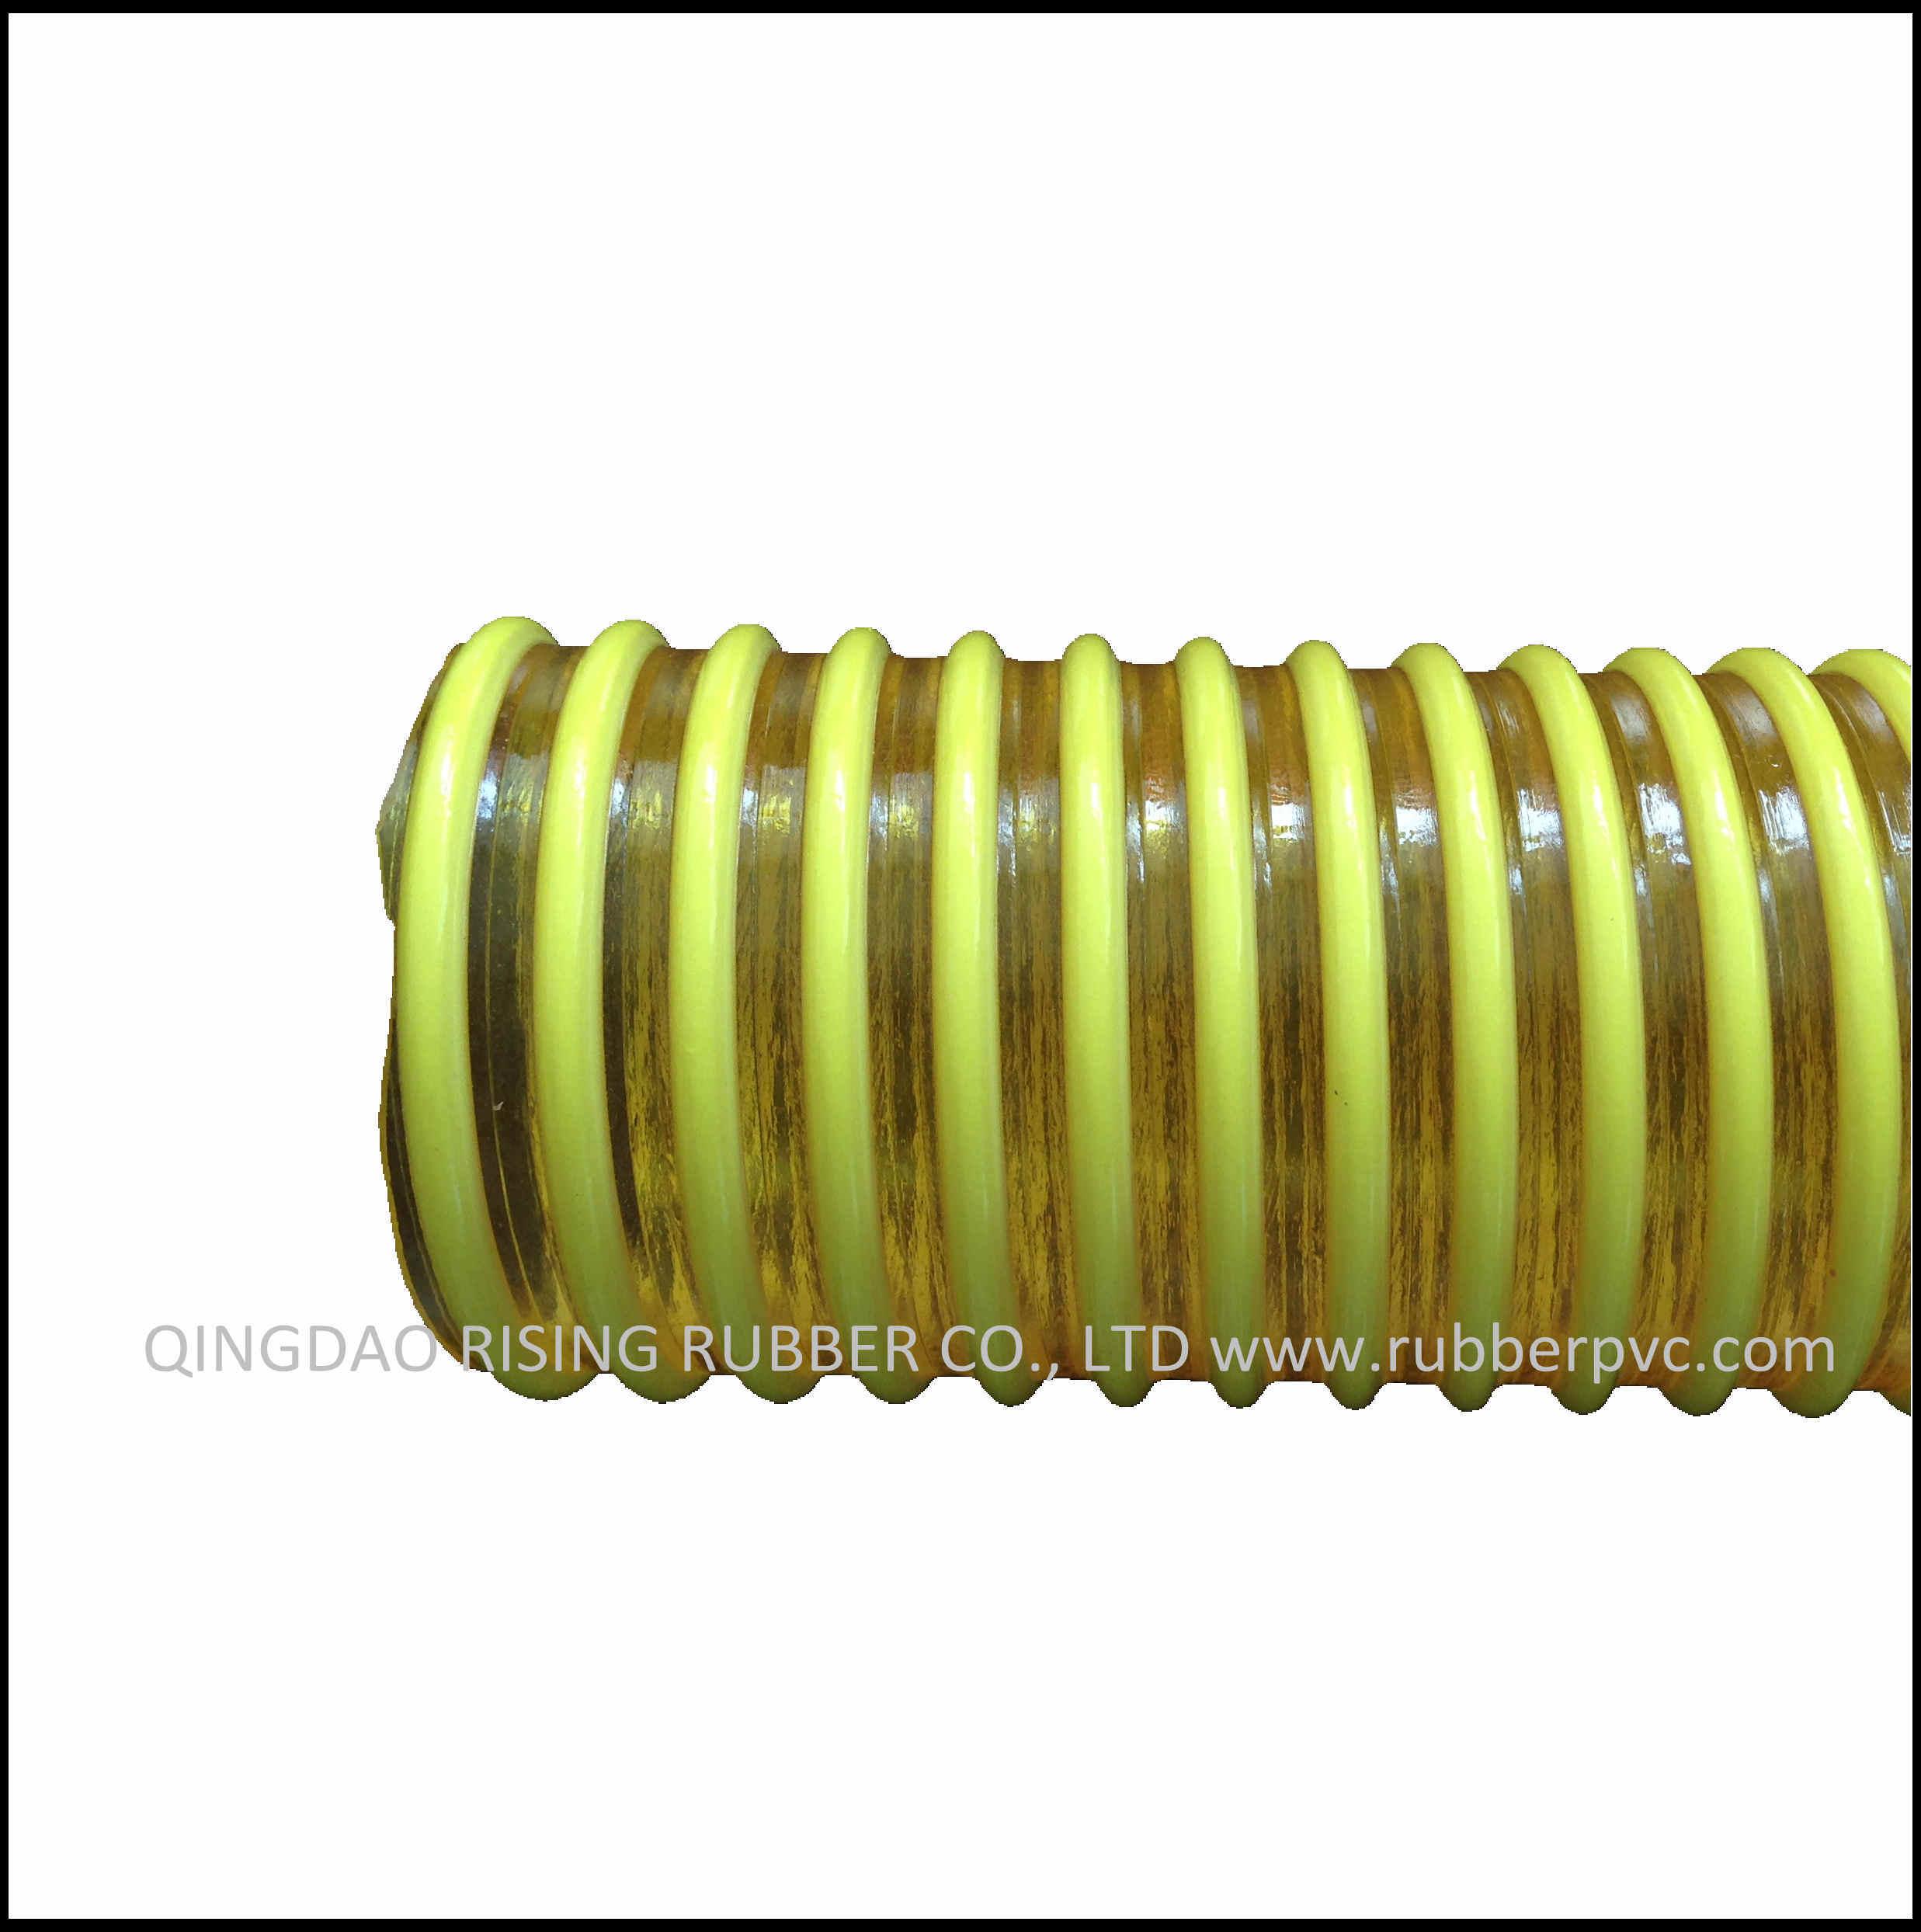 Flexible PVC Helix Suction Water Hose